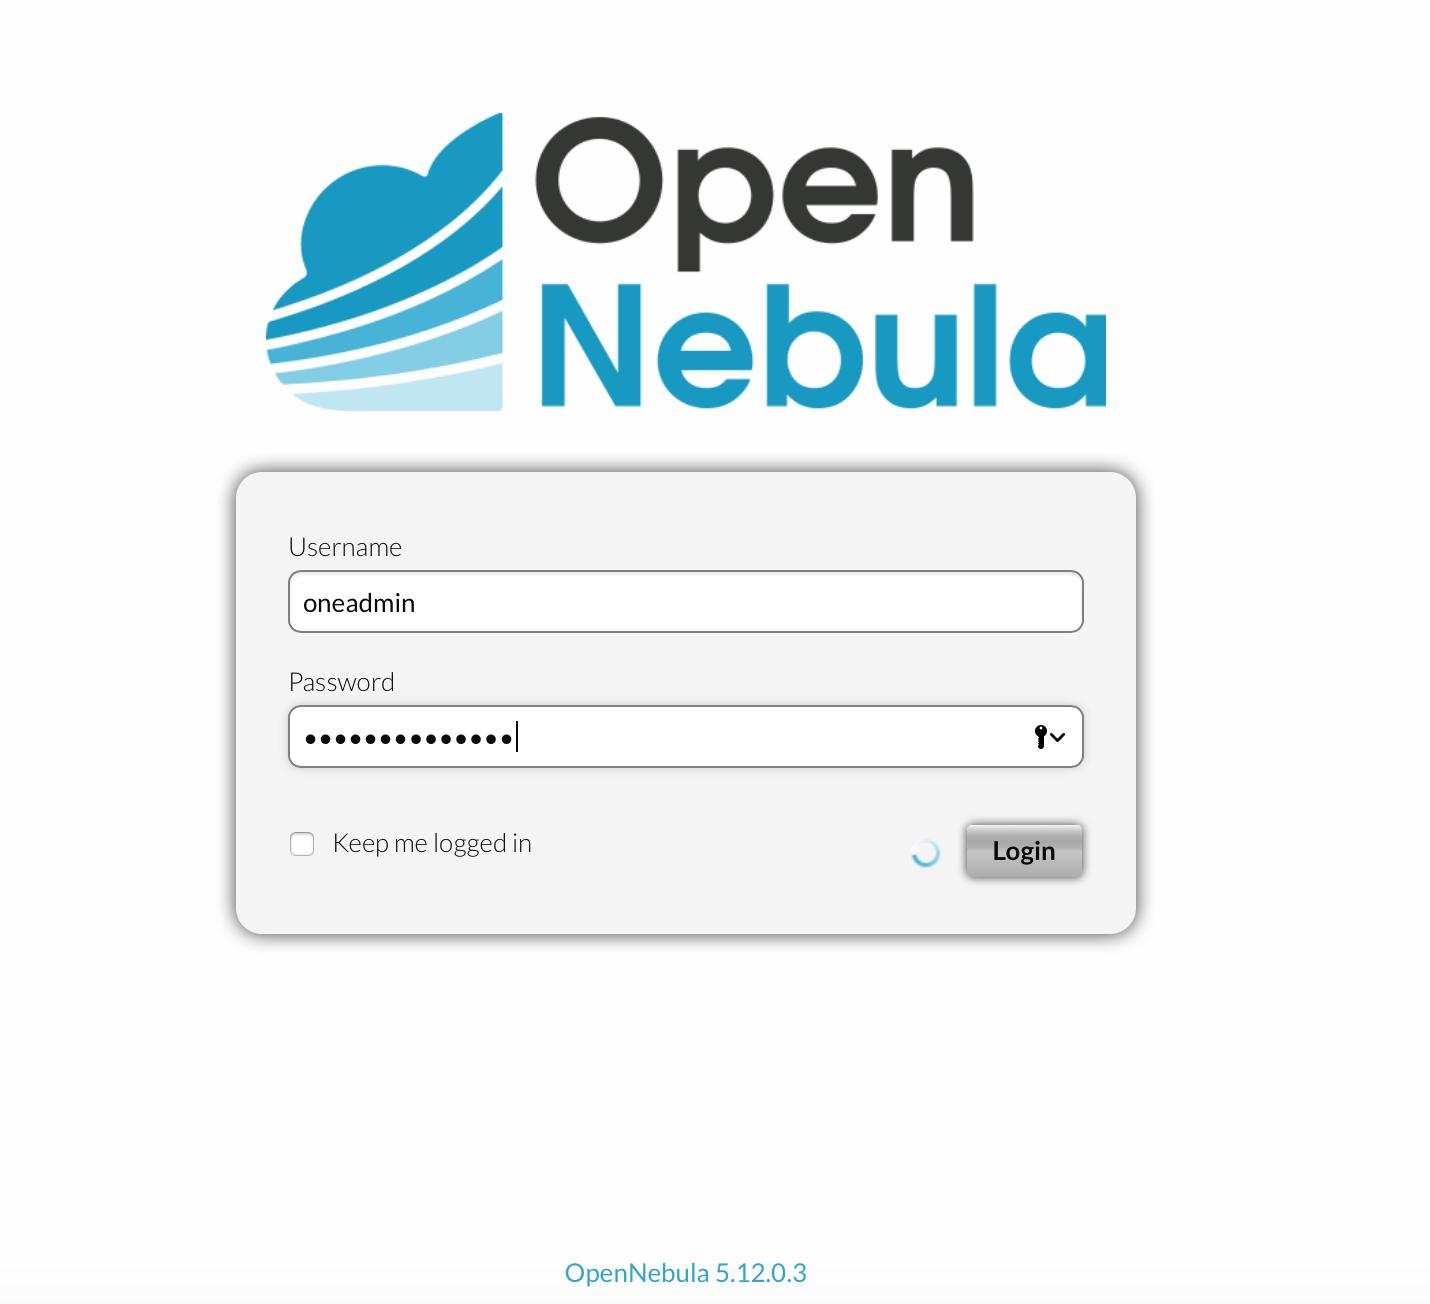 acceso_opennebula